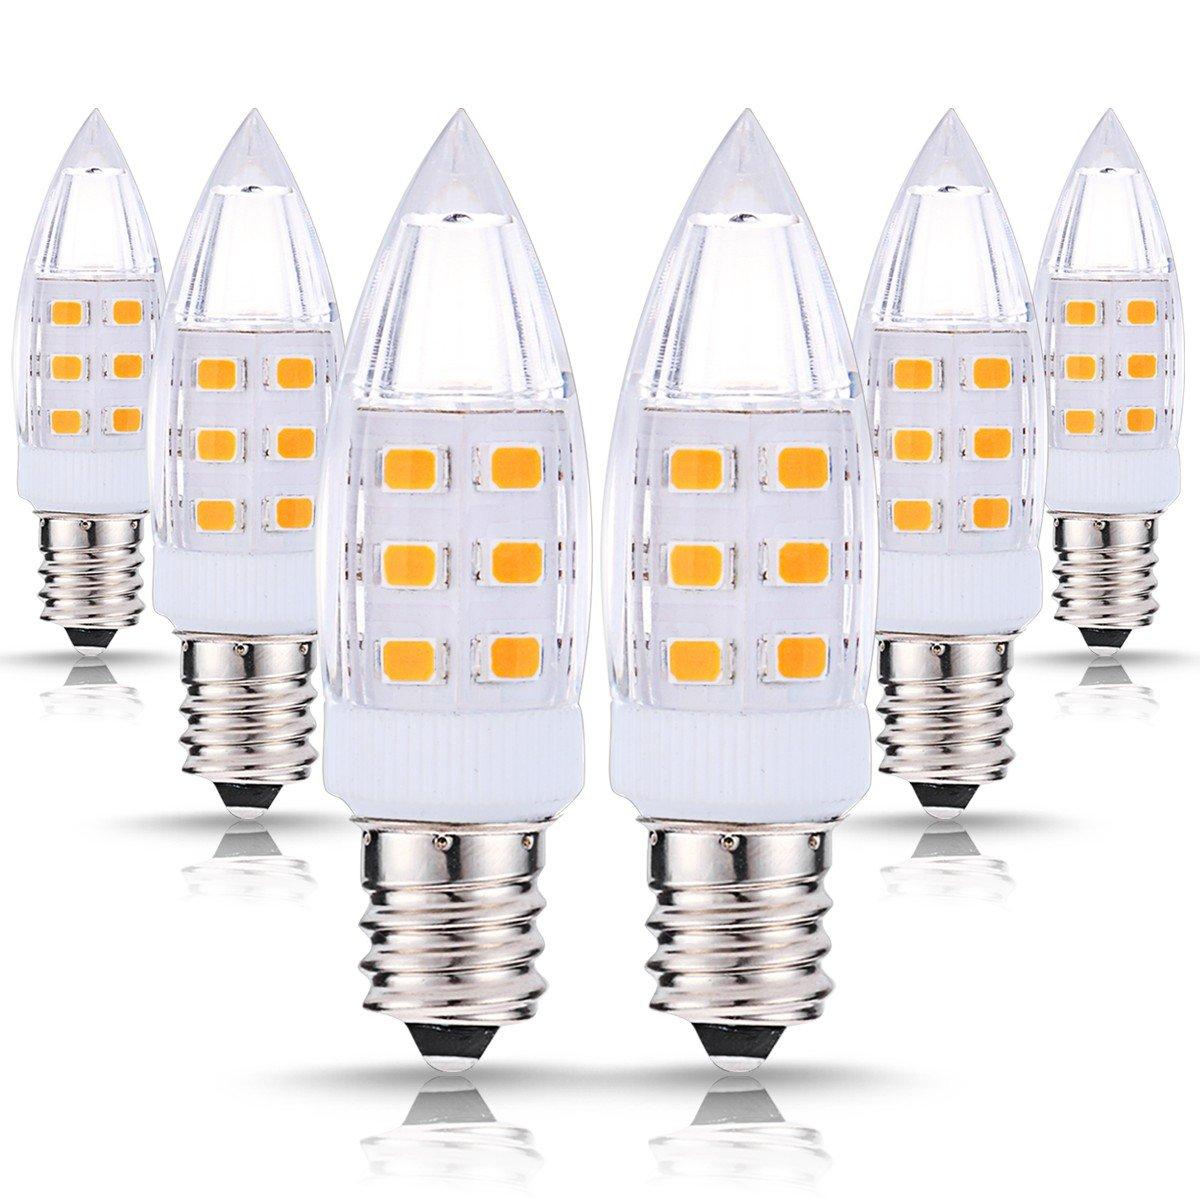 JandCase LED C7 Candelabra Night Light Bulbs, 2W (15W Incandescent Equivalent), 200LM, Natural Daylight White (4000K), Candelabra Base Bulbs for Salt Lamp, Mason Jar, Window Candle, 6 Pack